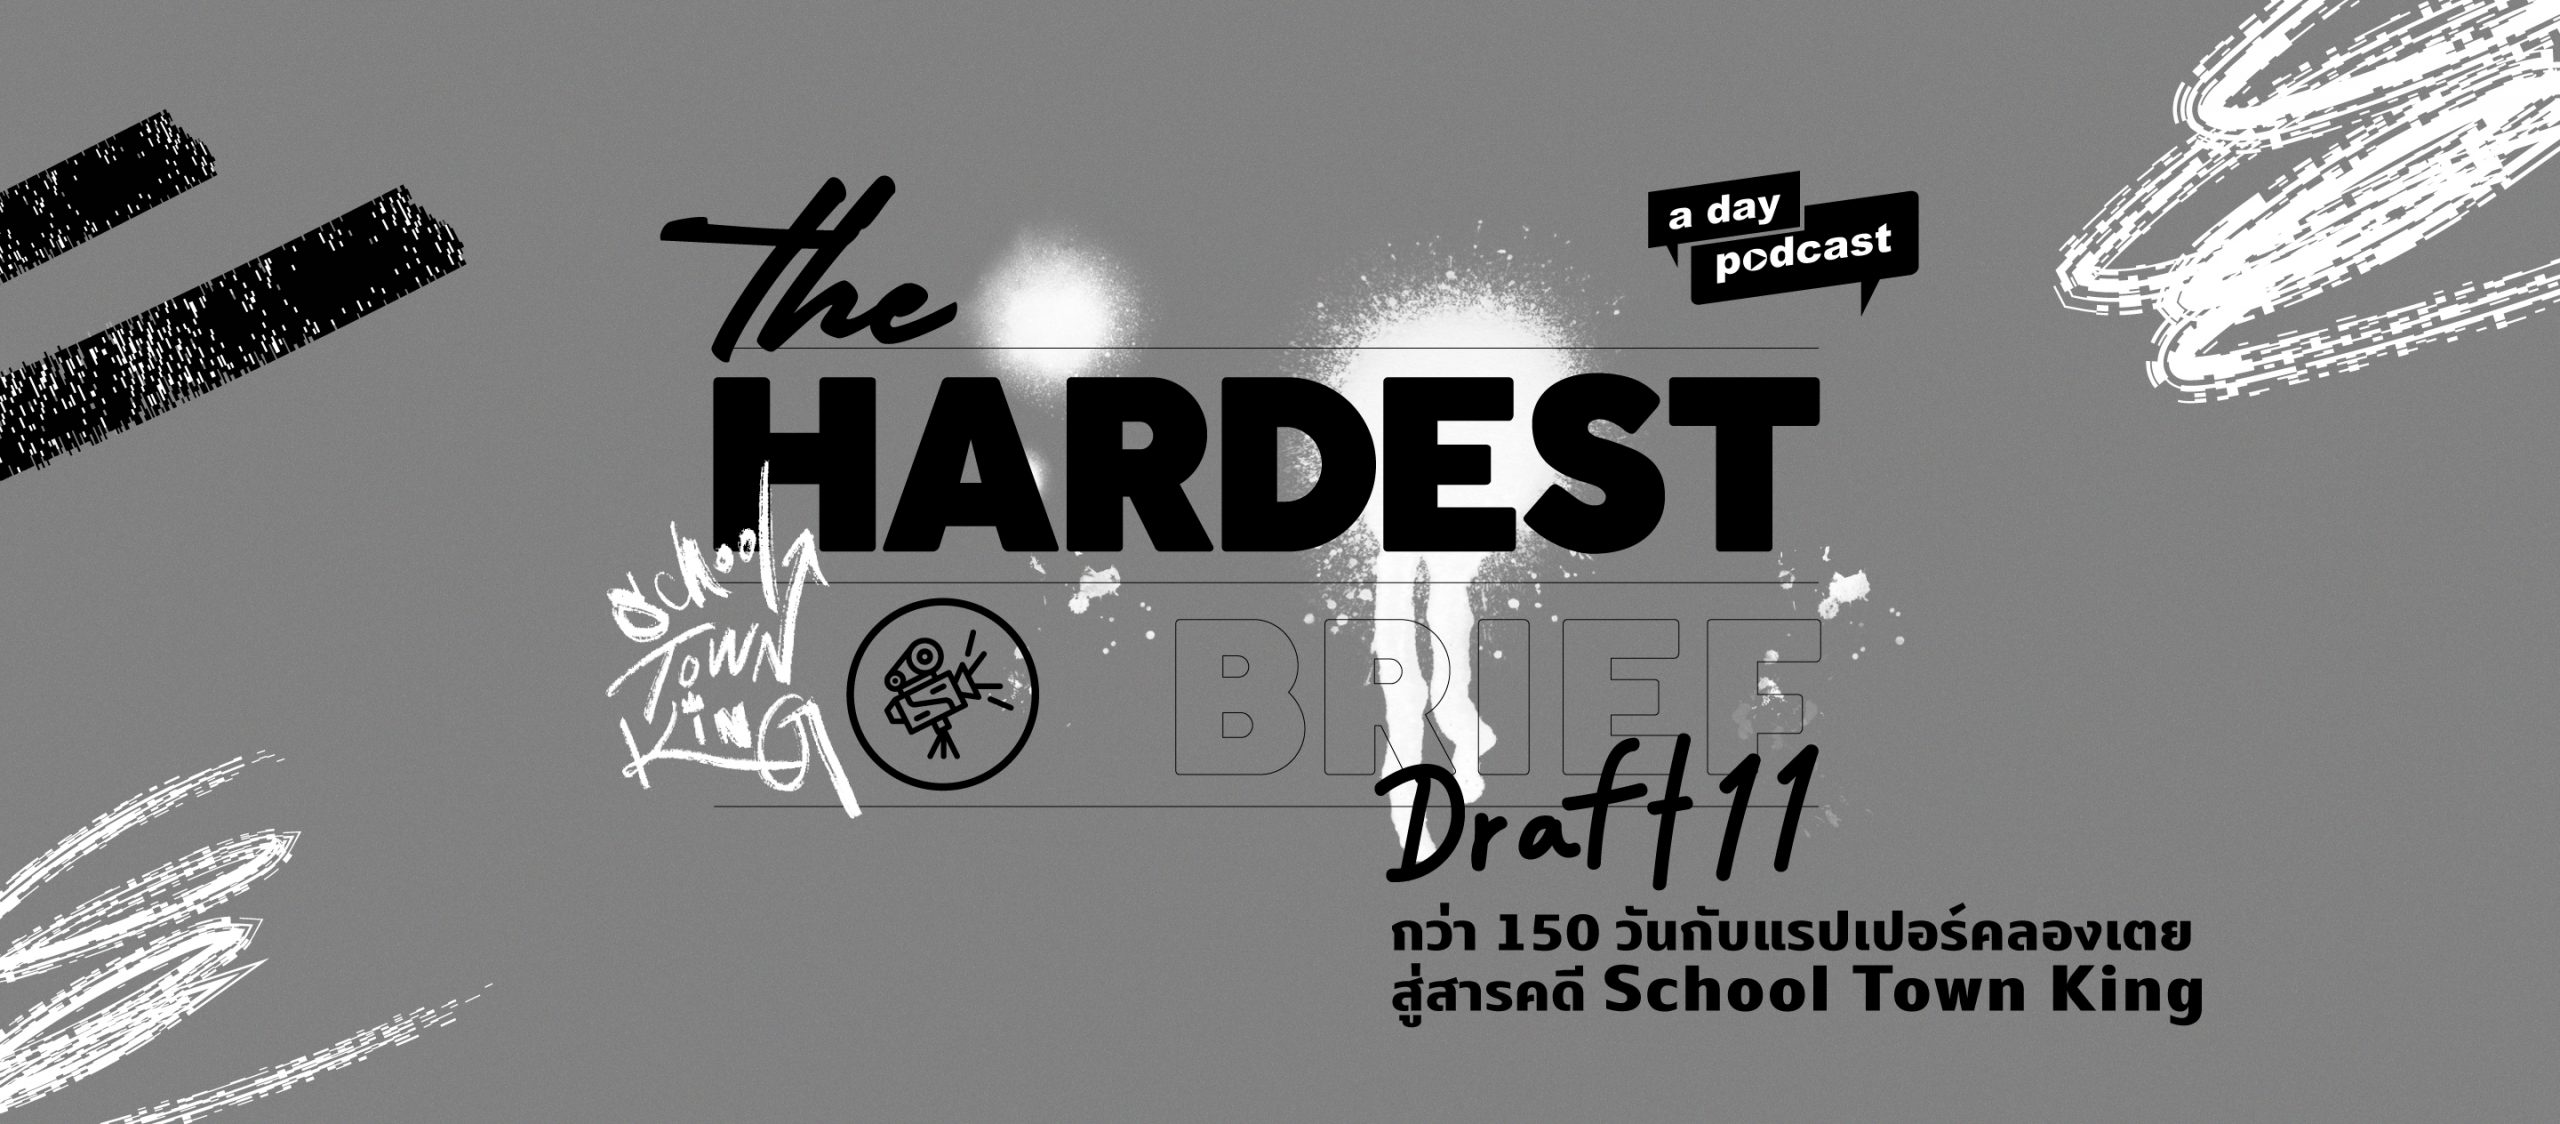 The Hardest Brief EP.11 กว่า 150 วันกับแรปเปอร์คลองเตย สู่สารคดี School Town King | เบสท์ วรรจธนภูมิ